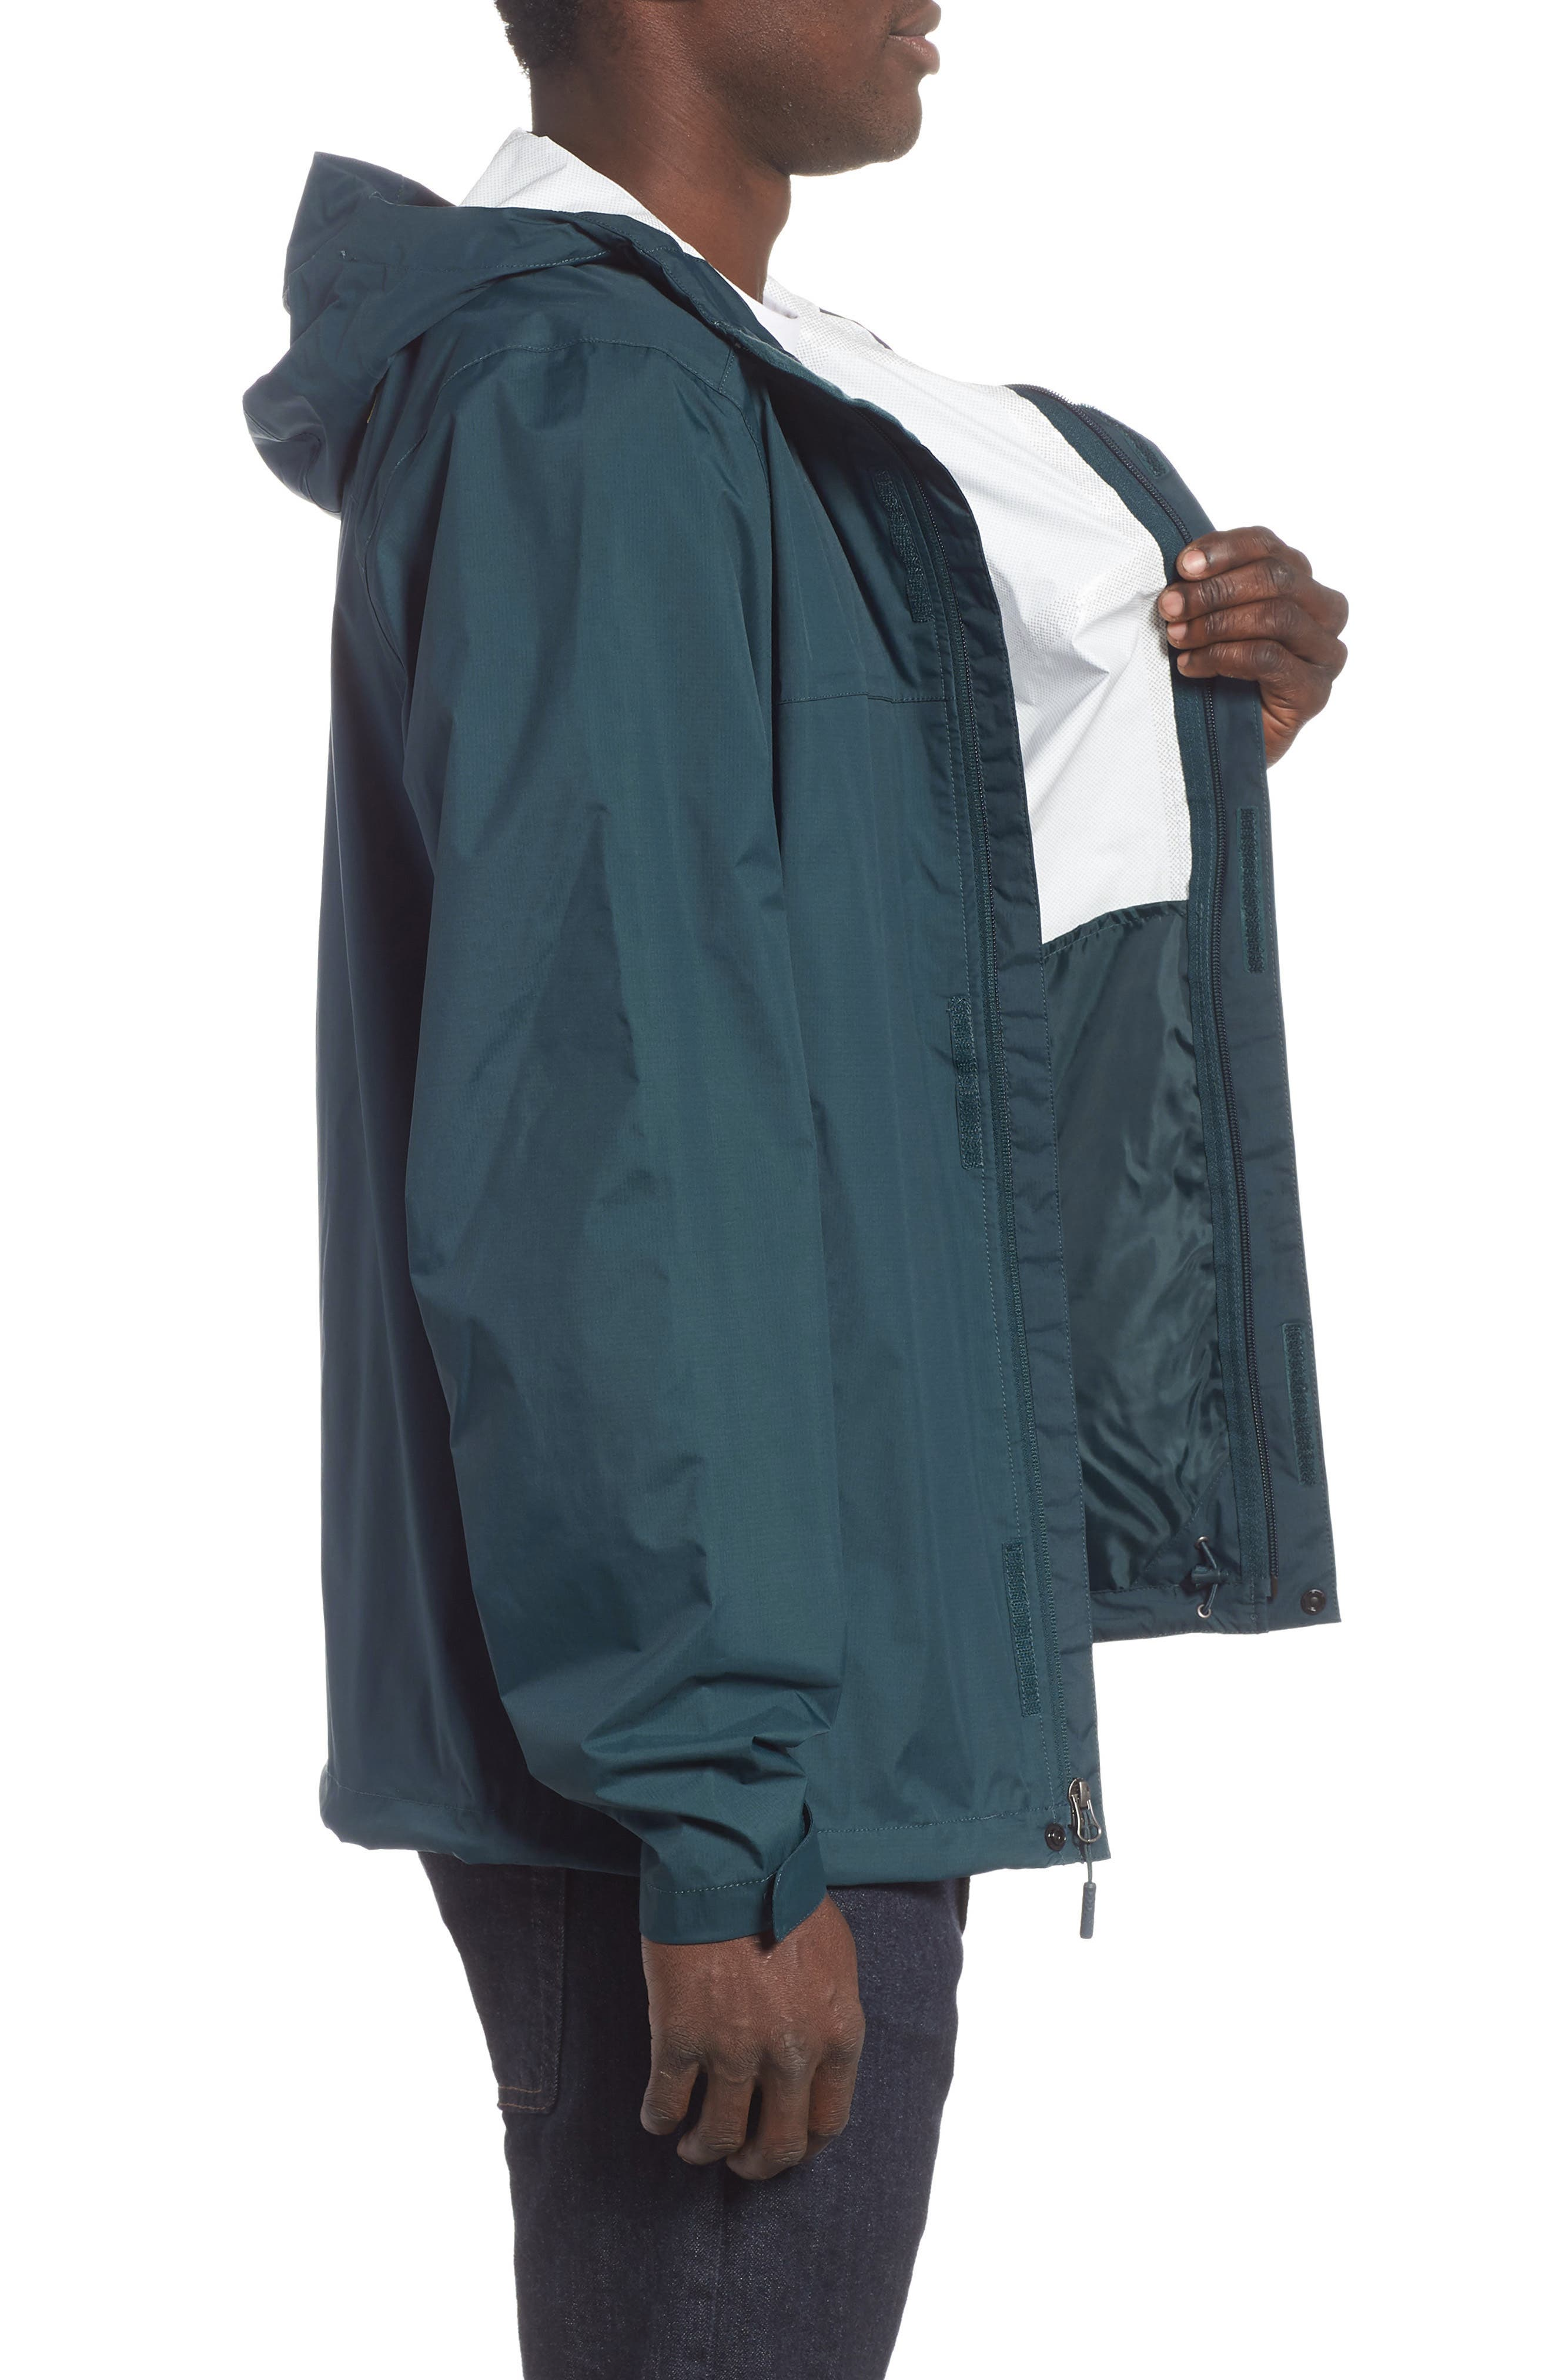 THE NORTH FACE,                             Venture II Raincoat,                             Alternate thumbnail 4, color,                             KODIAK BLUE/ KODIAK BLUE